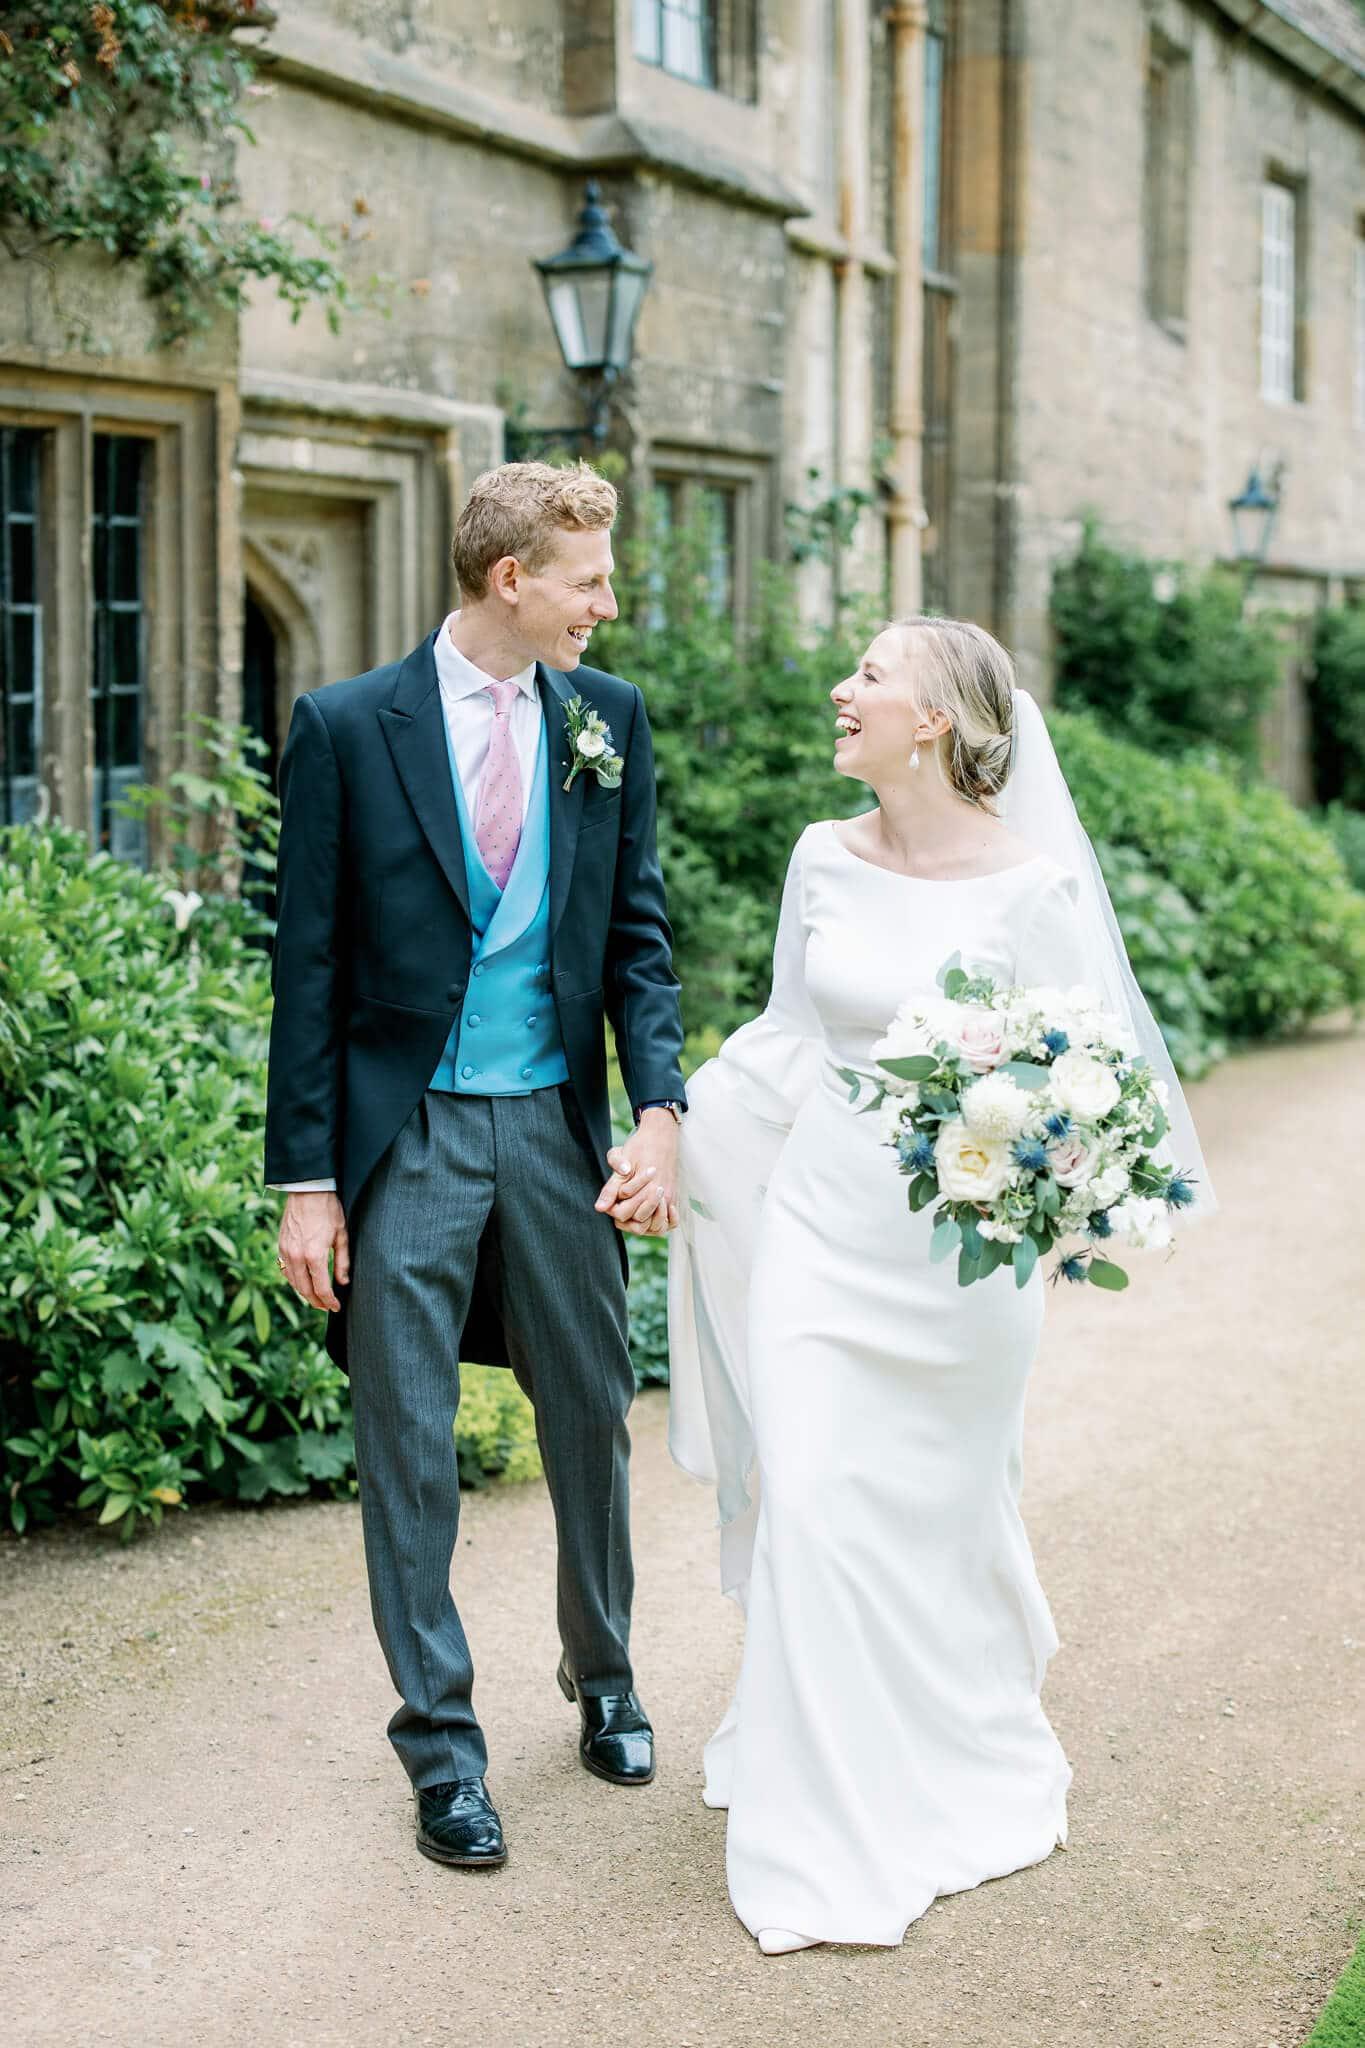 wedding at worcester college school in Oxford